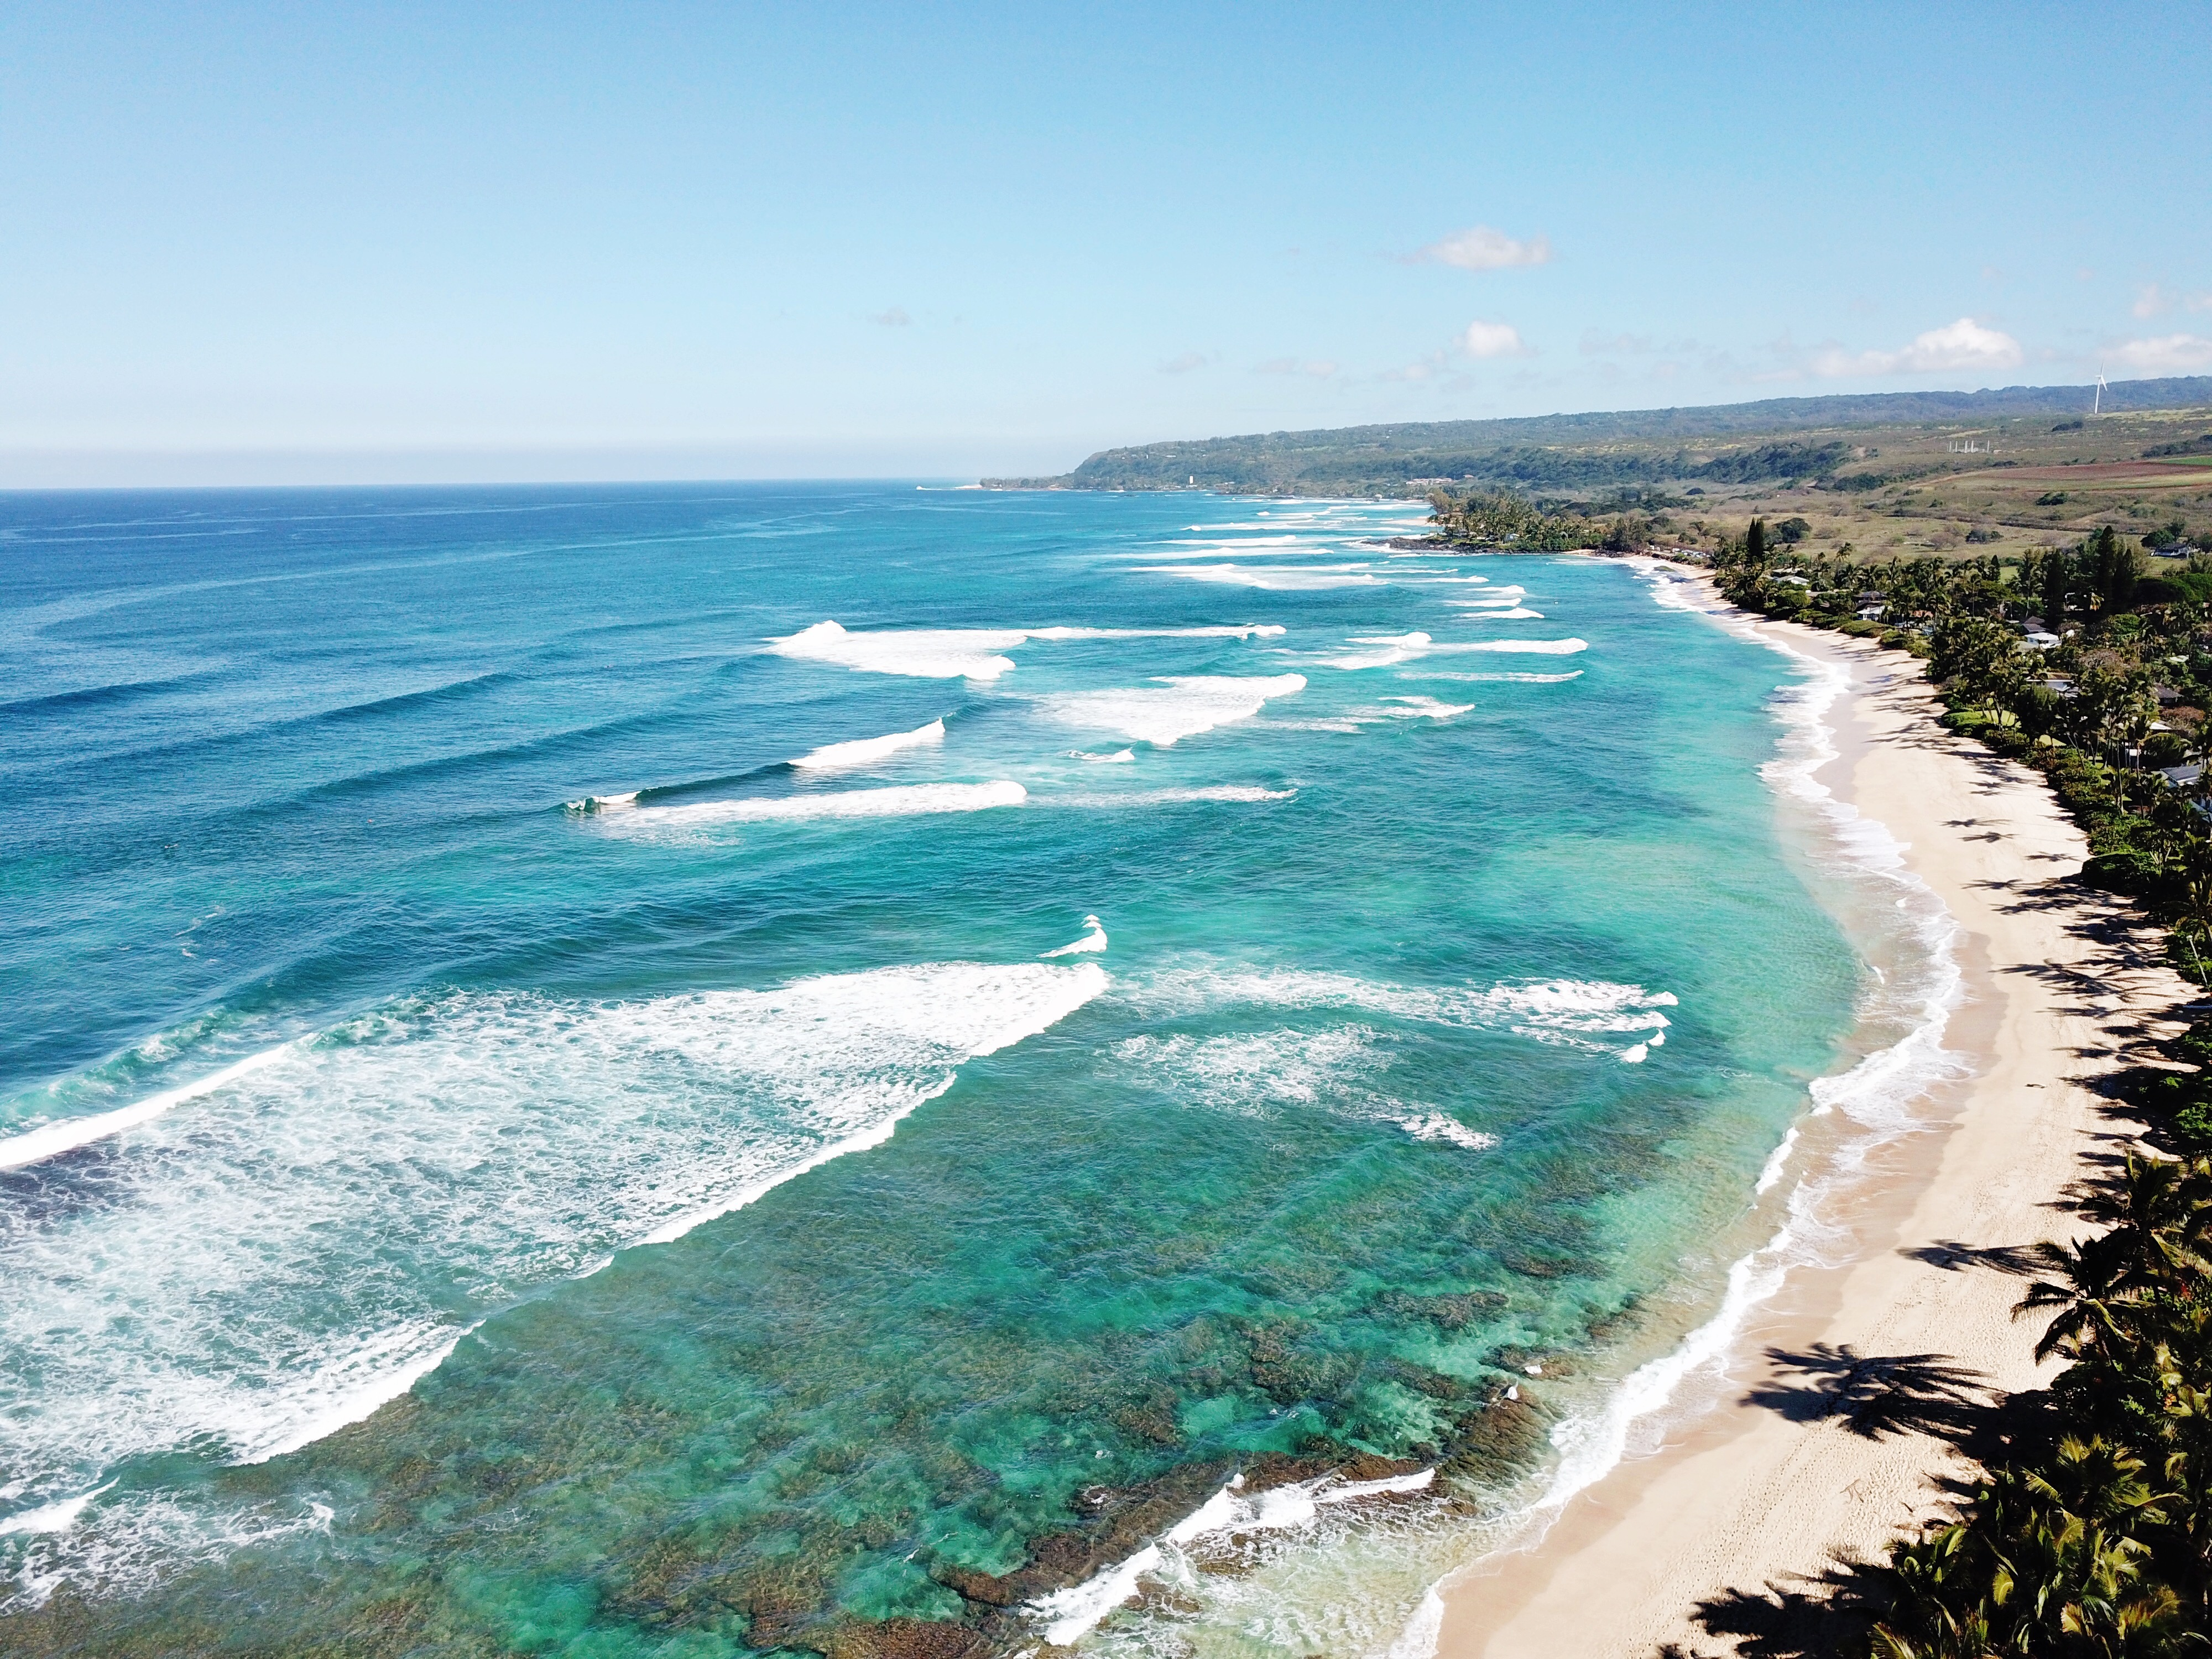 North Shore Oahu - Winter Waves - Life Lately - Communikait by Kait Hanson